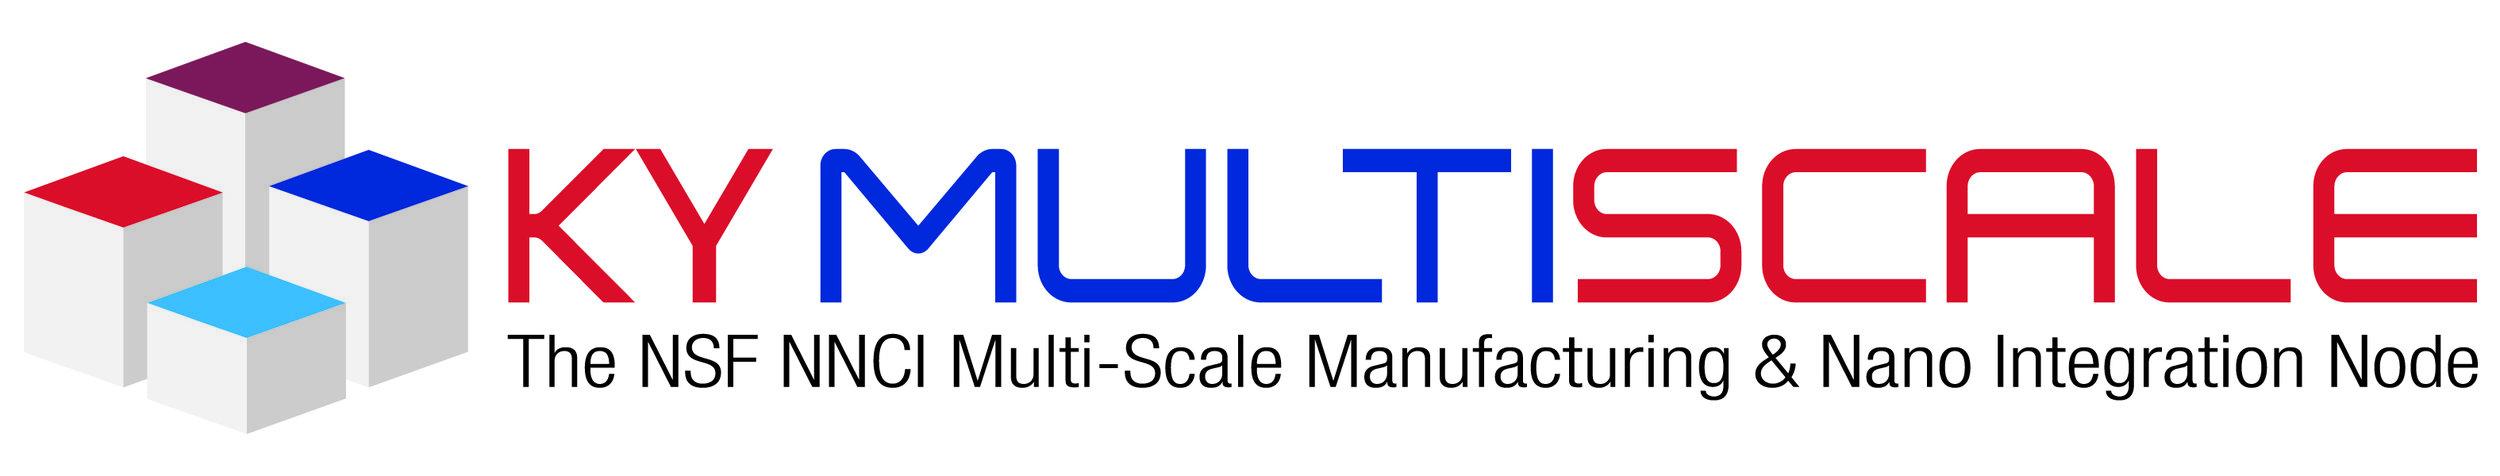 KY MUltI-Scale Manufacturing & NANO Integration Node